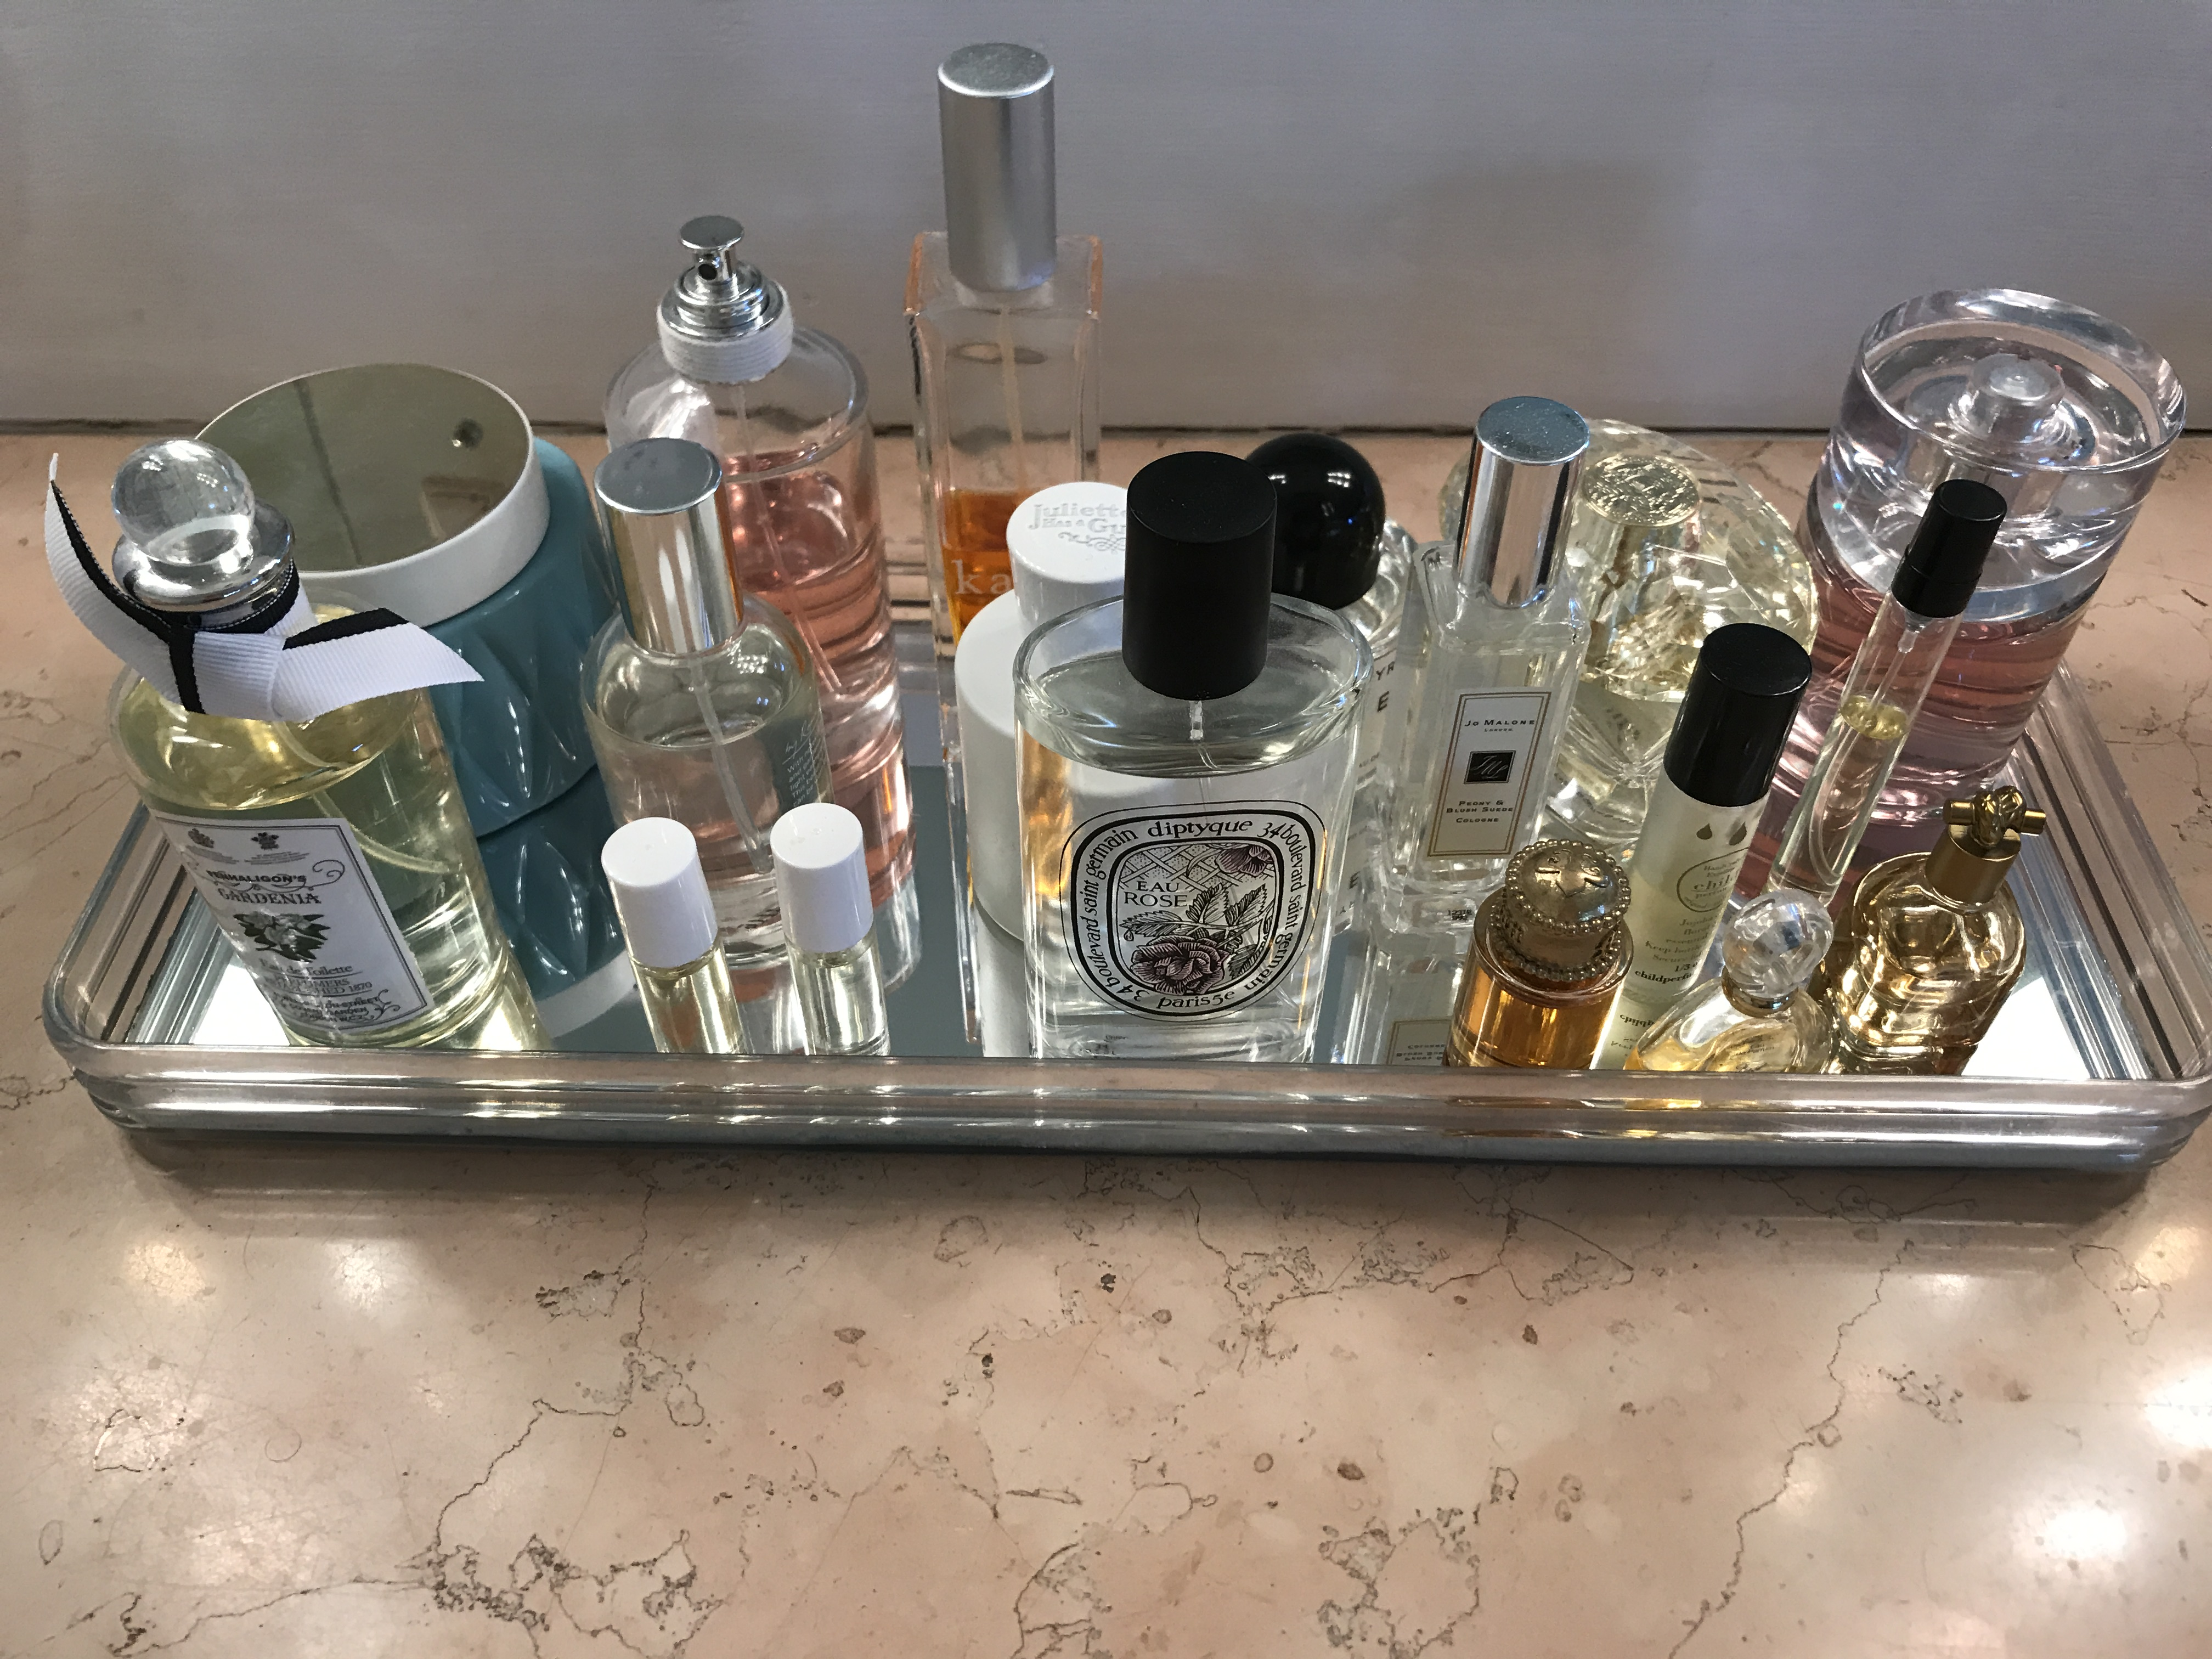 15c75de3 SIZE MATTERS: PERFUME BOTTLE SIZES - My Fabulous Fragrance